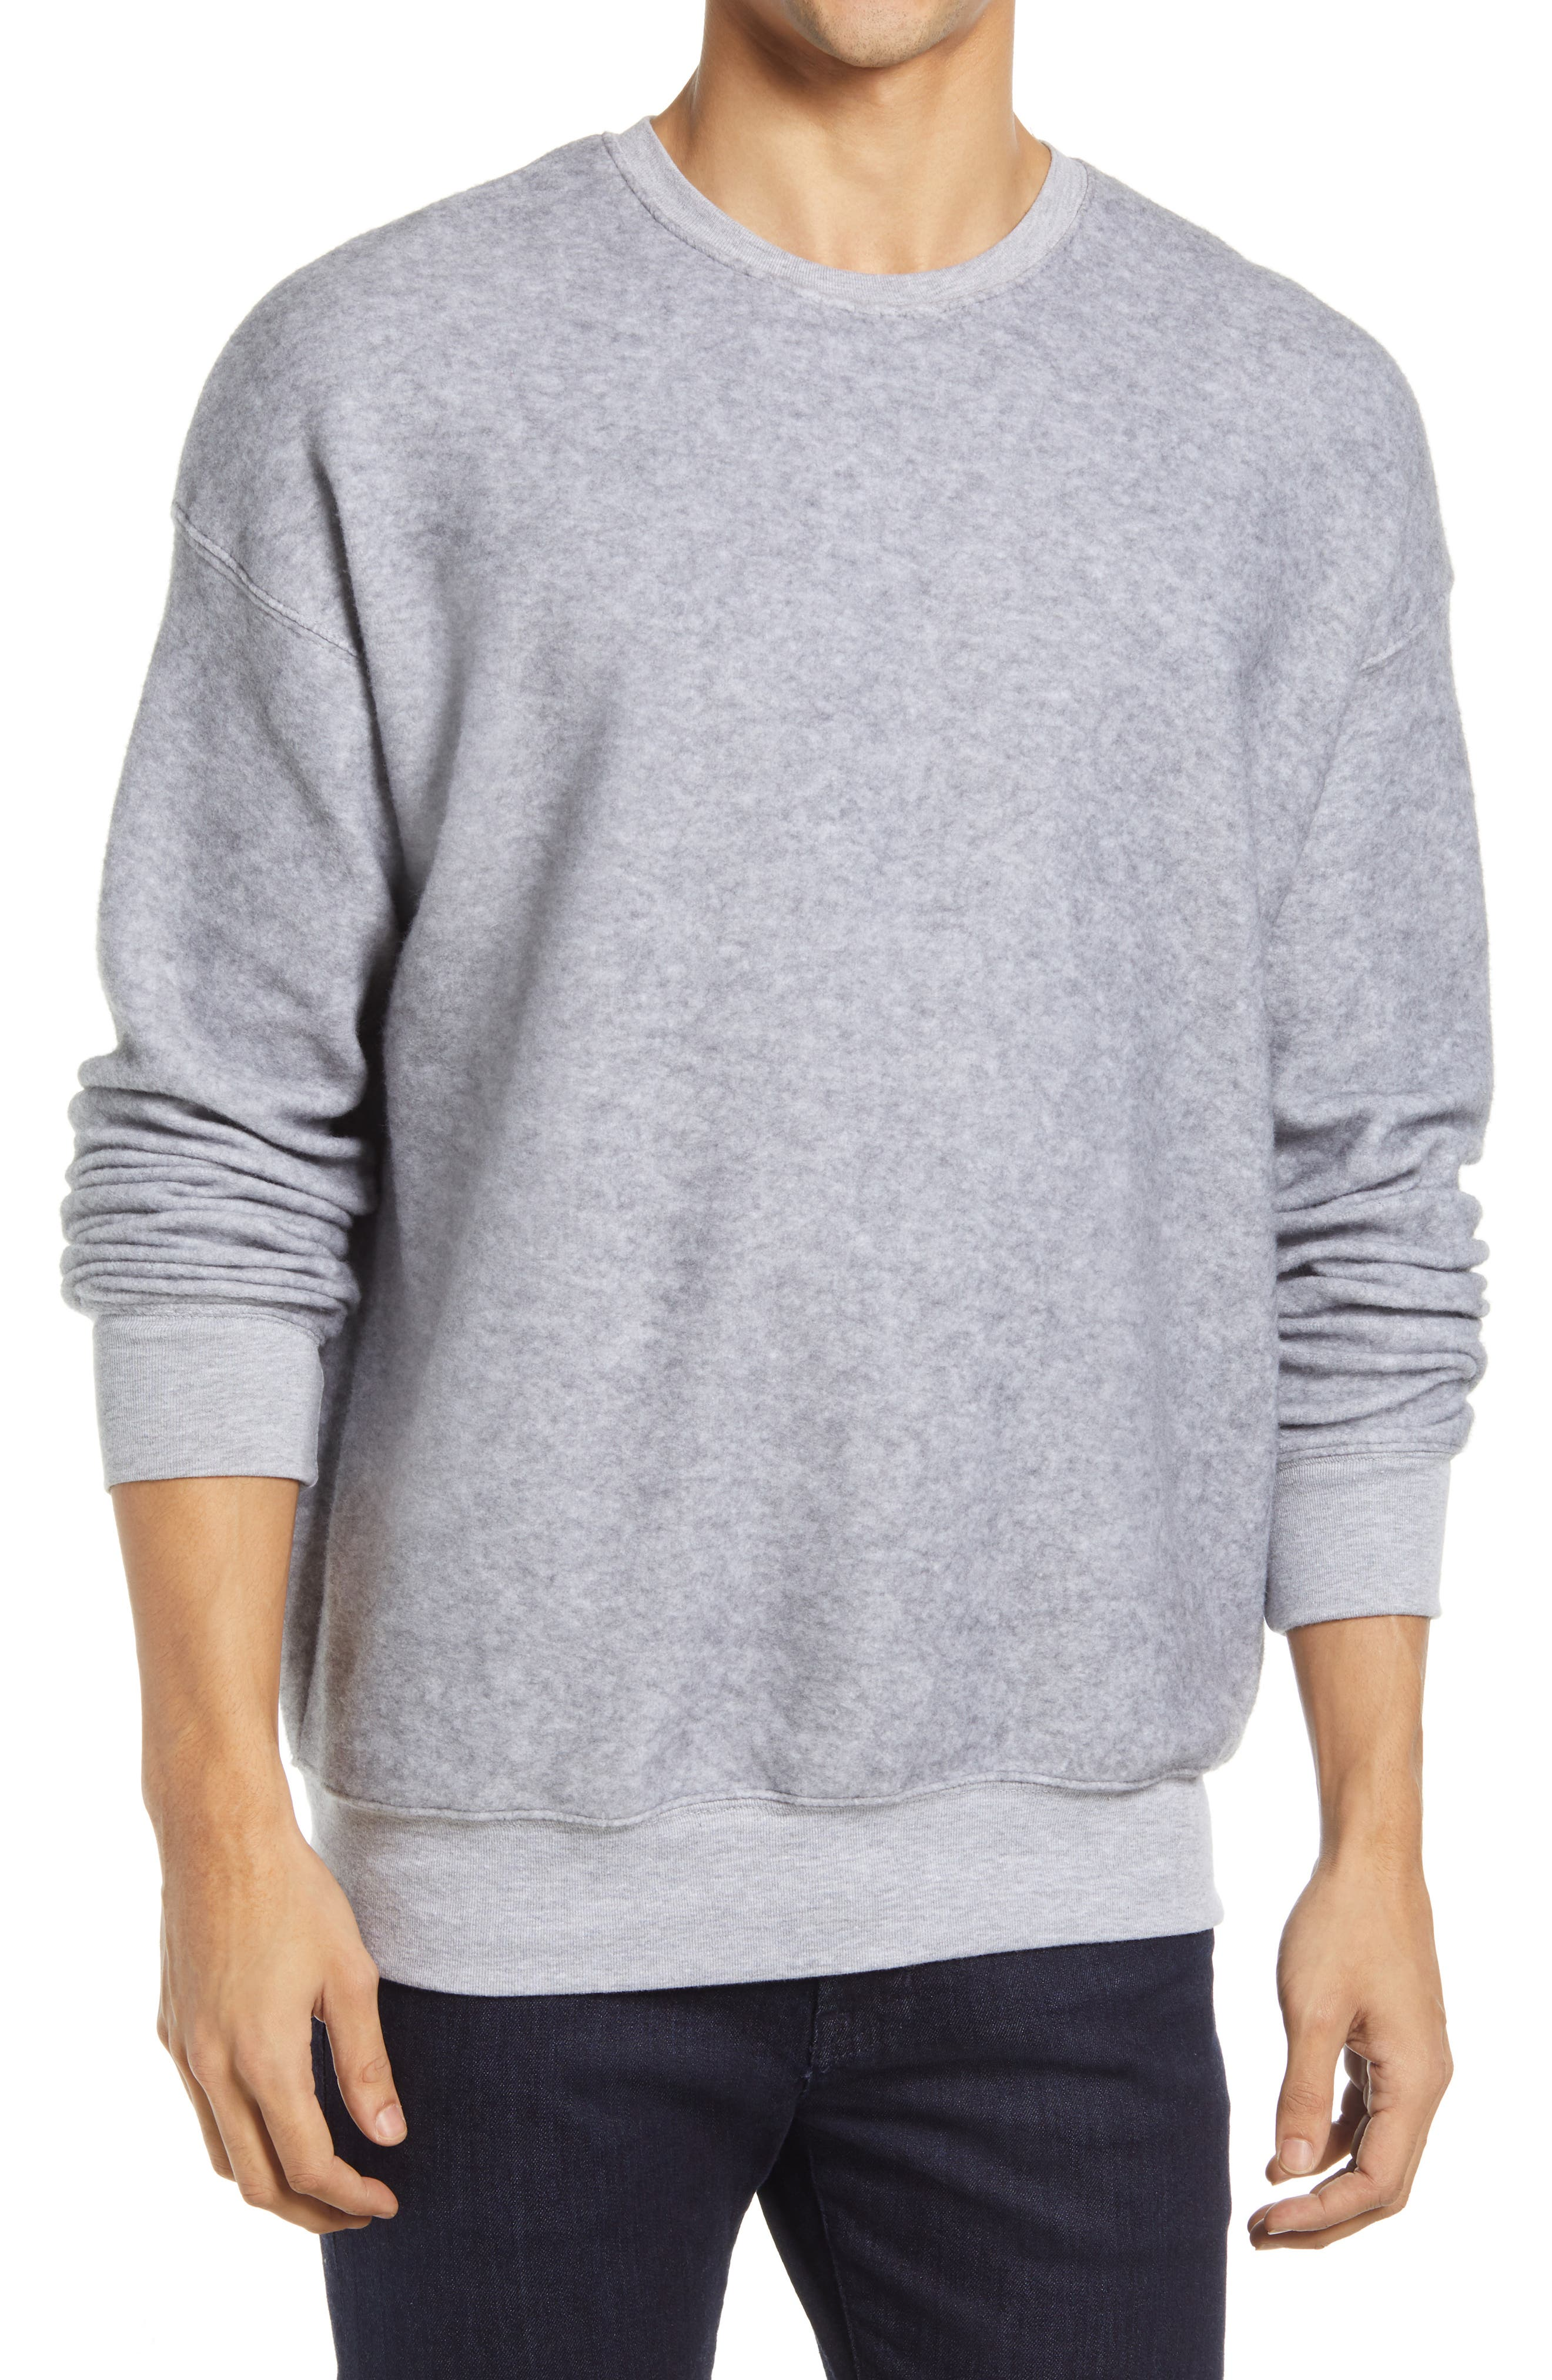 Men's Bella+Canvas Cotton Blend Crewneck Sweatshirt